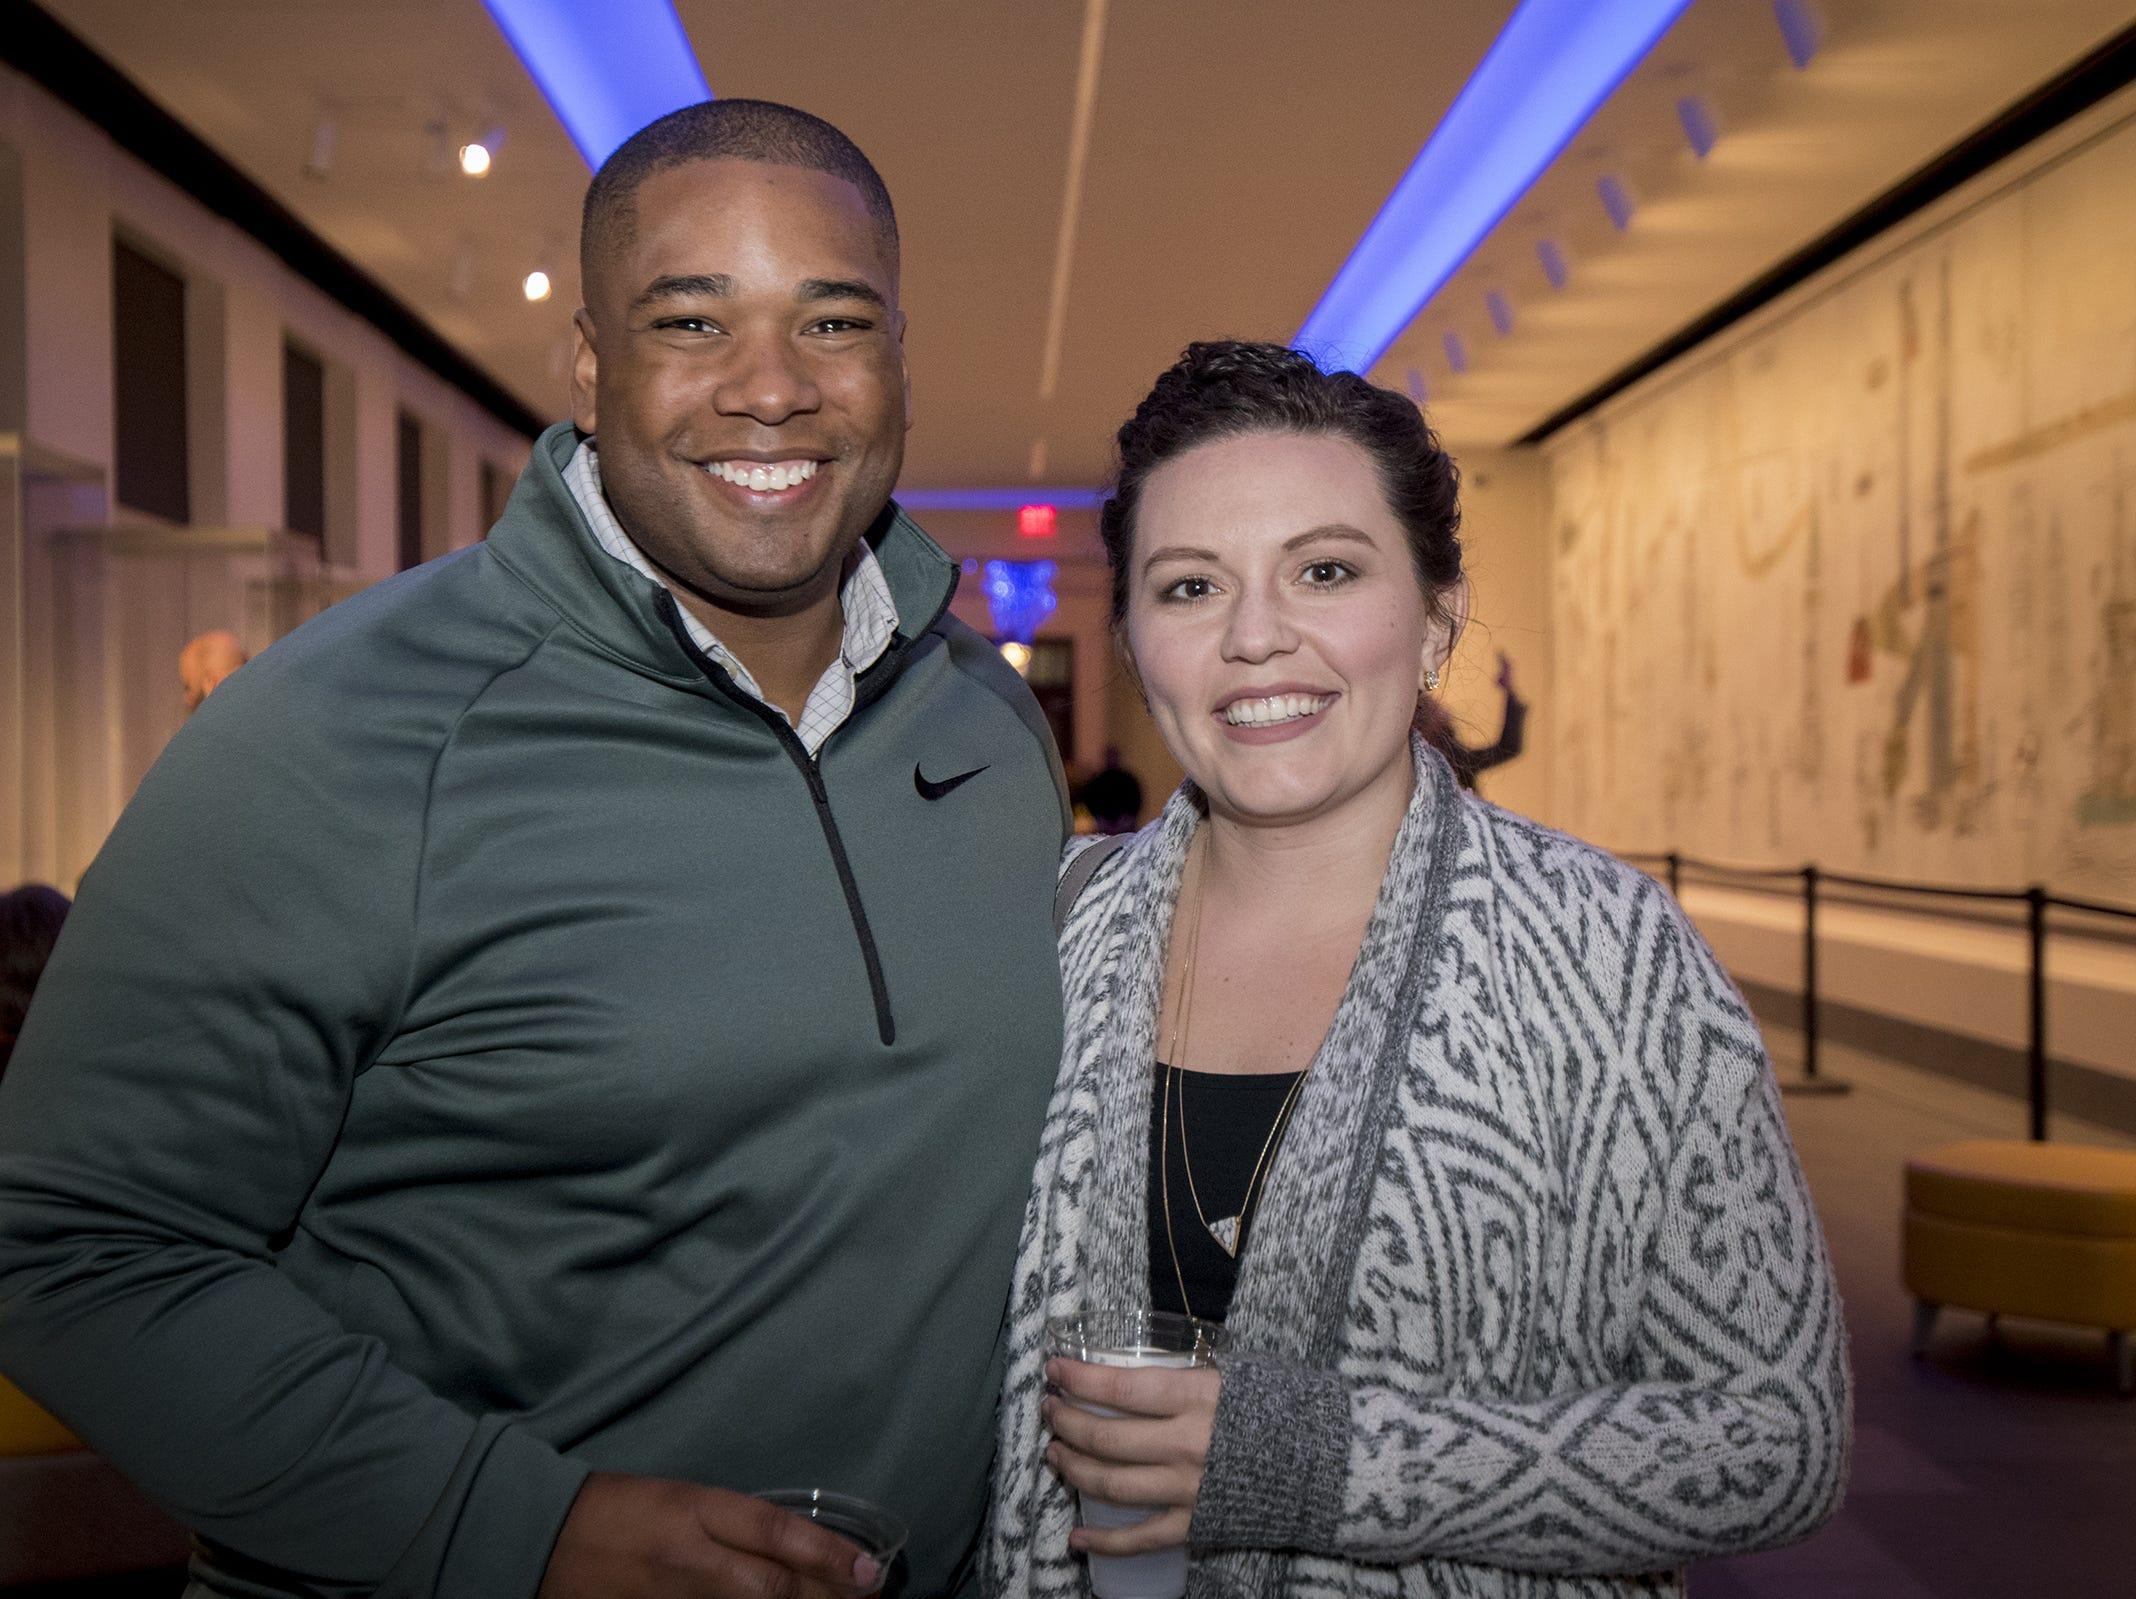 Micah Dickson and Heather Knox attend Art After Dark at the Cincinnati Art Museum Wednesday, November 21, 2018 in Cincinnati, Ohio.